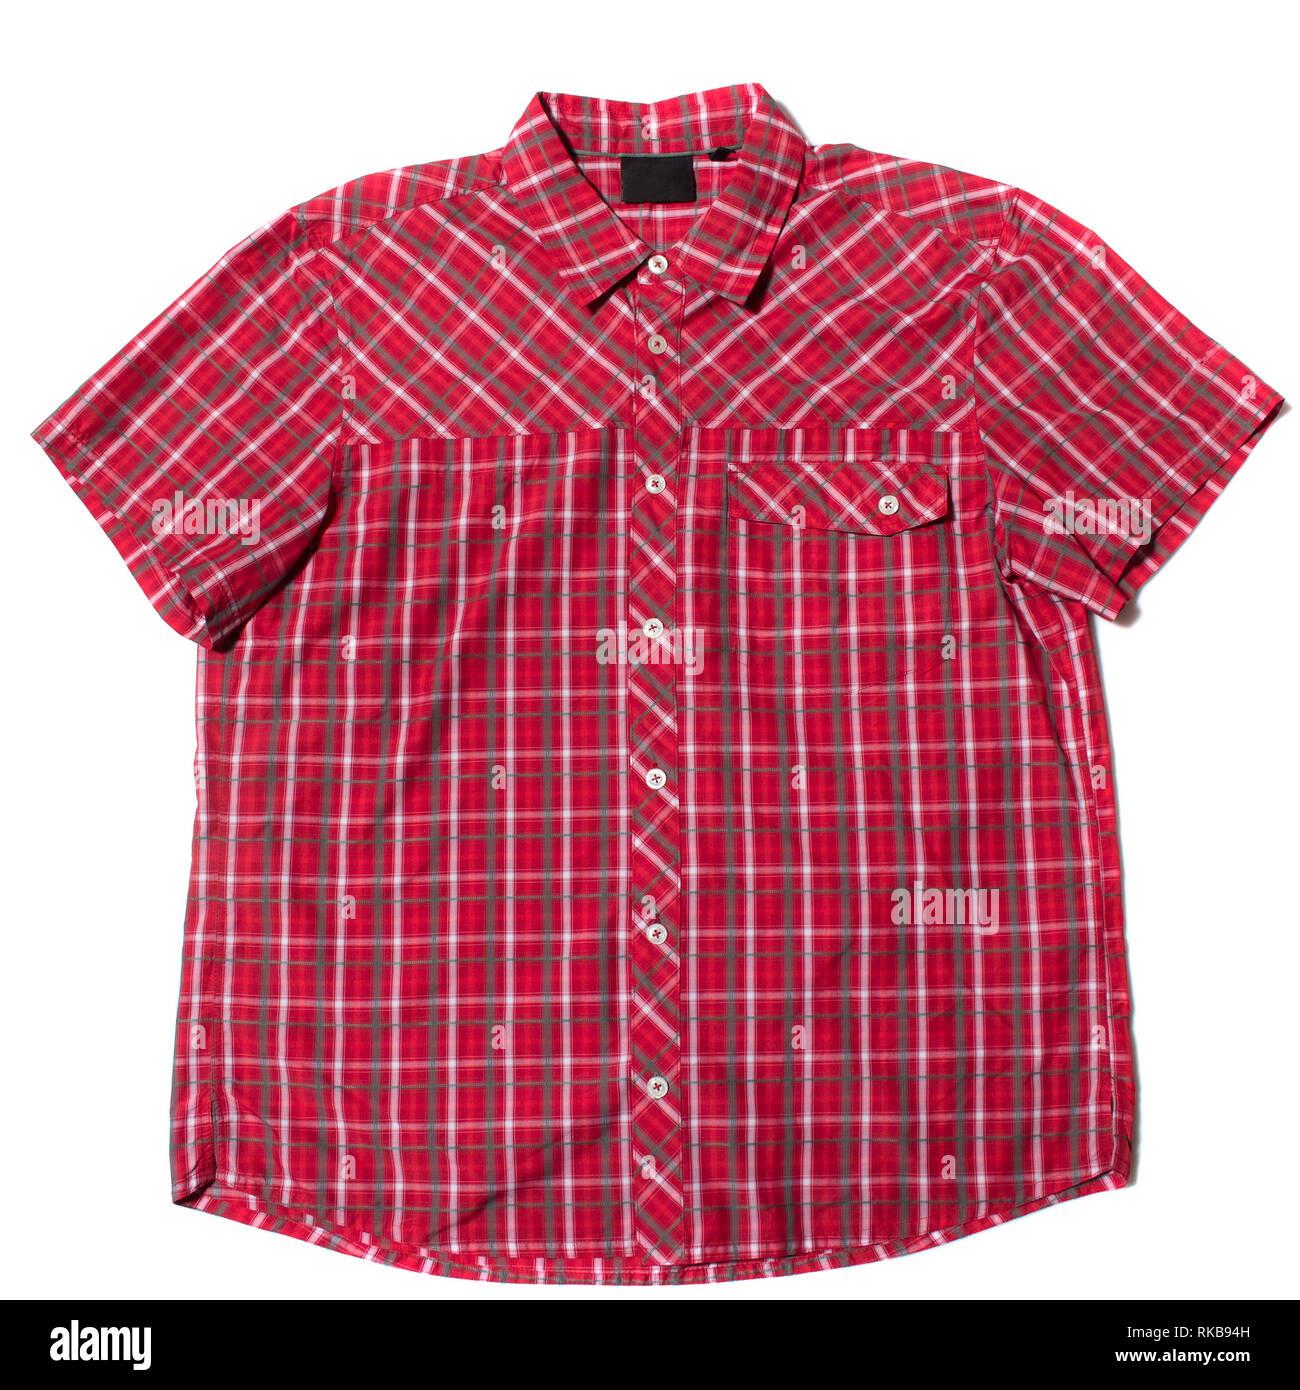 Camiseta de manga corta roja Imagen De Stock